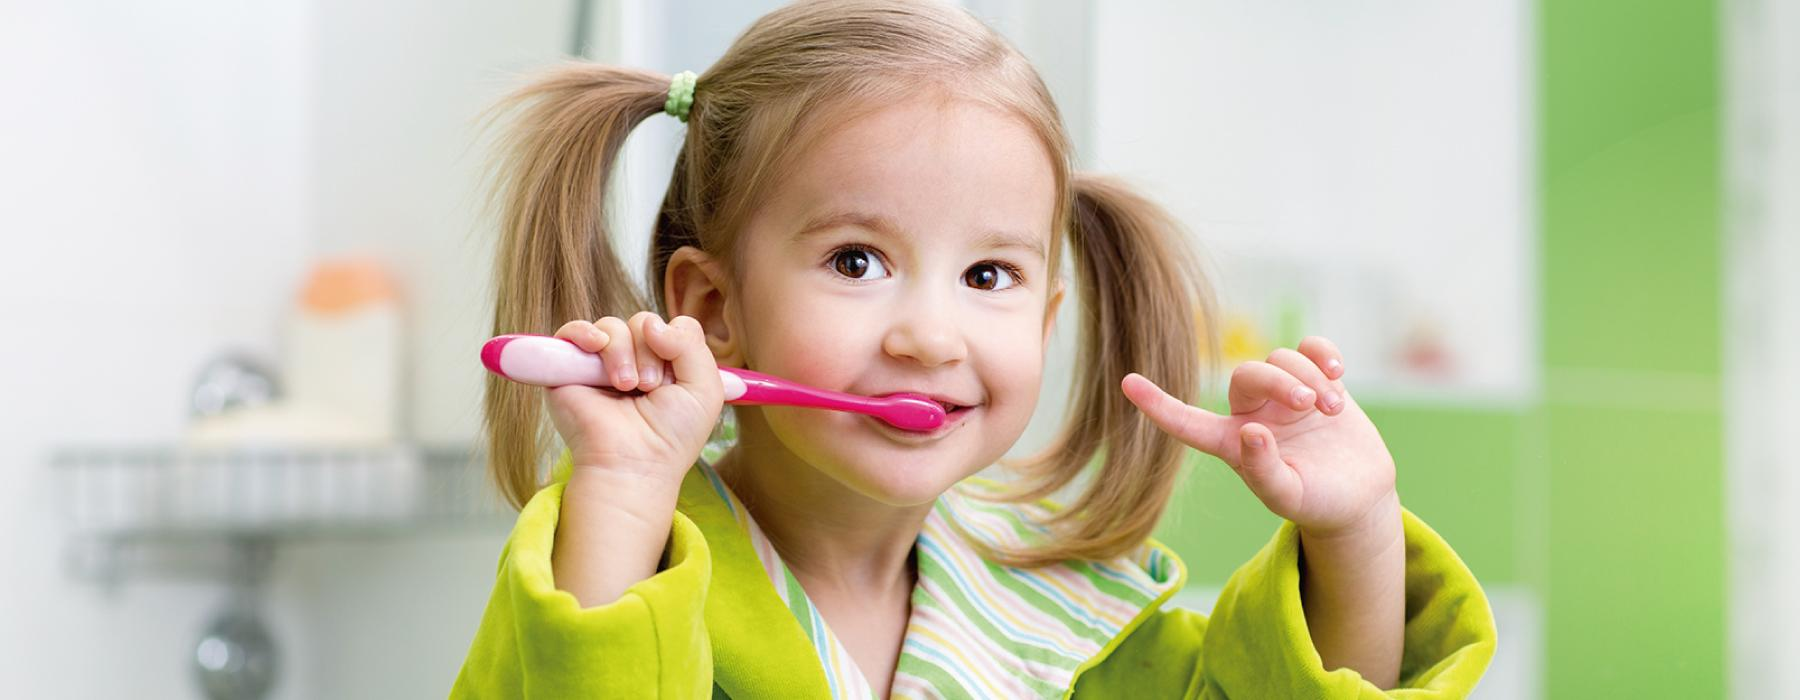 clinica-dentaria-medica